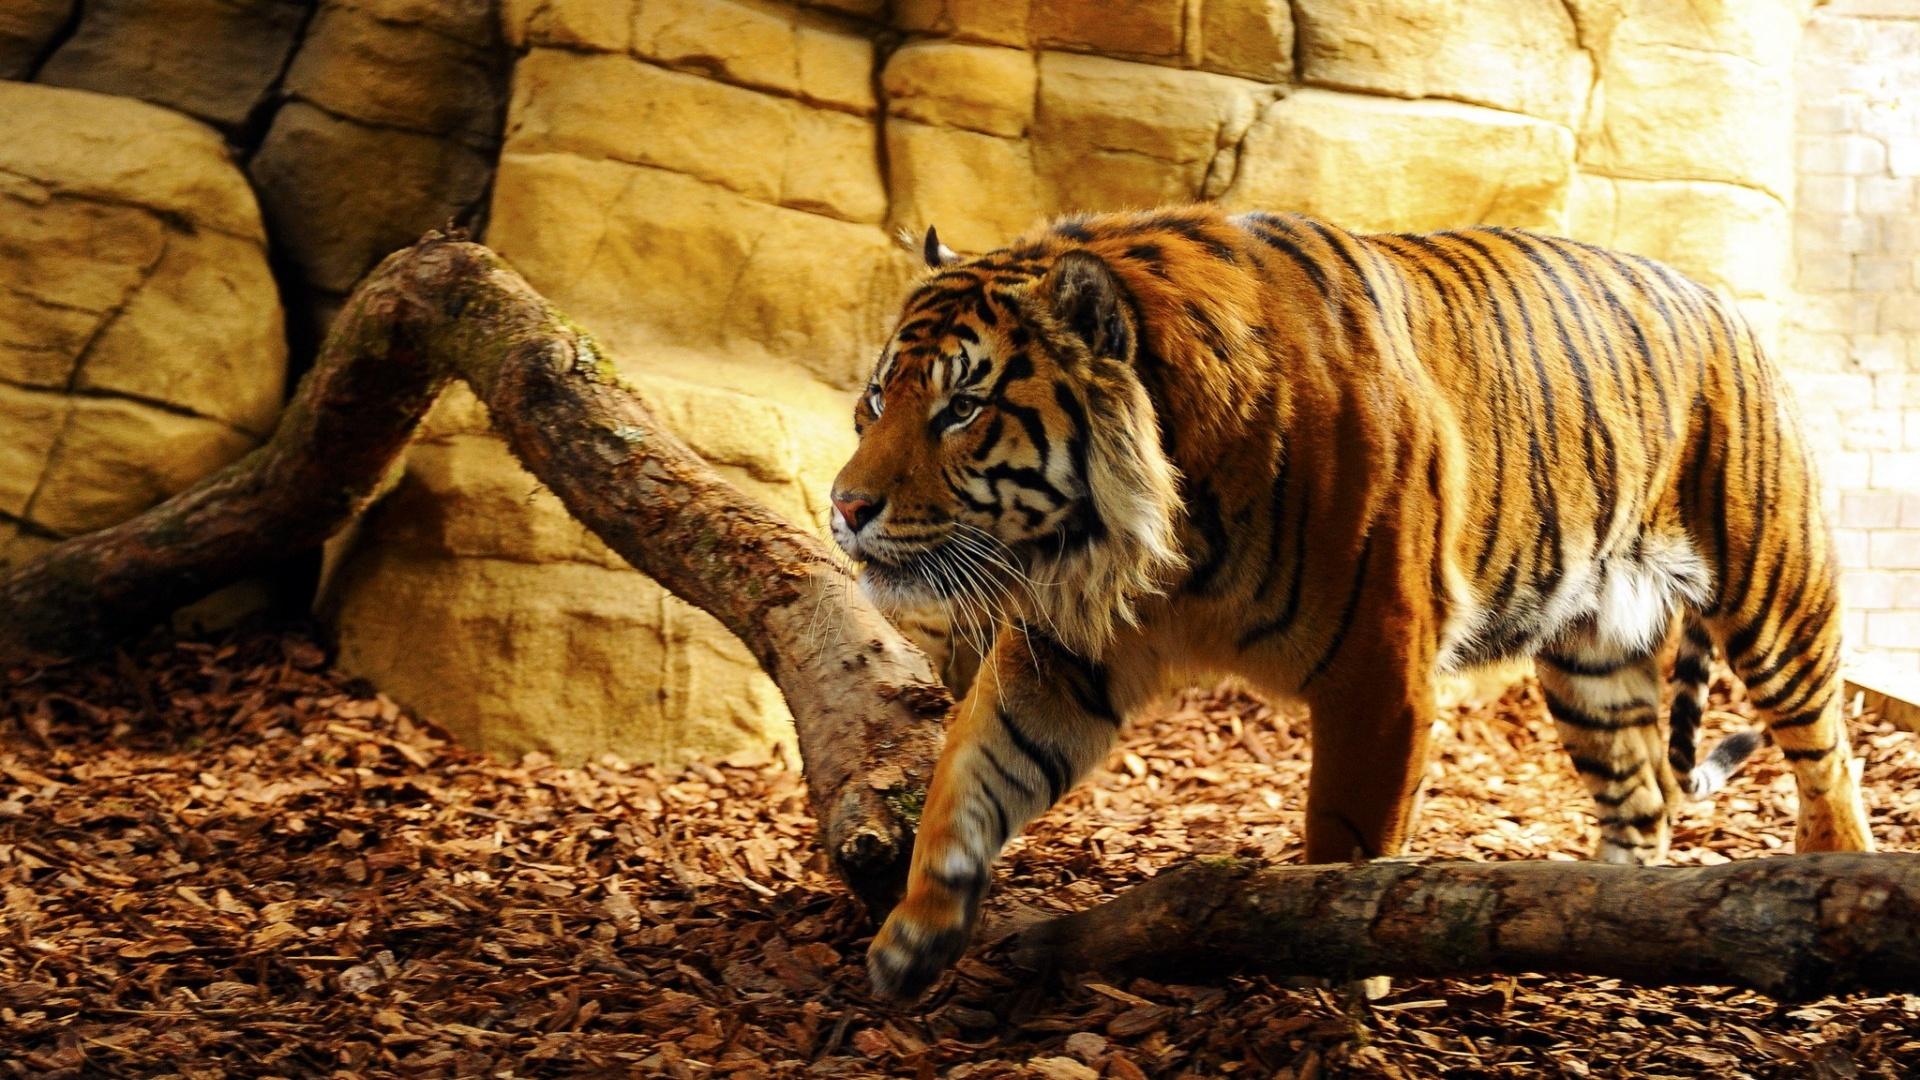 ... Tiger Wallpaper · Tiger Wallpaper